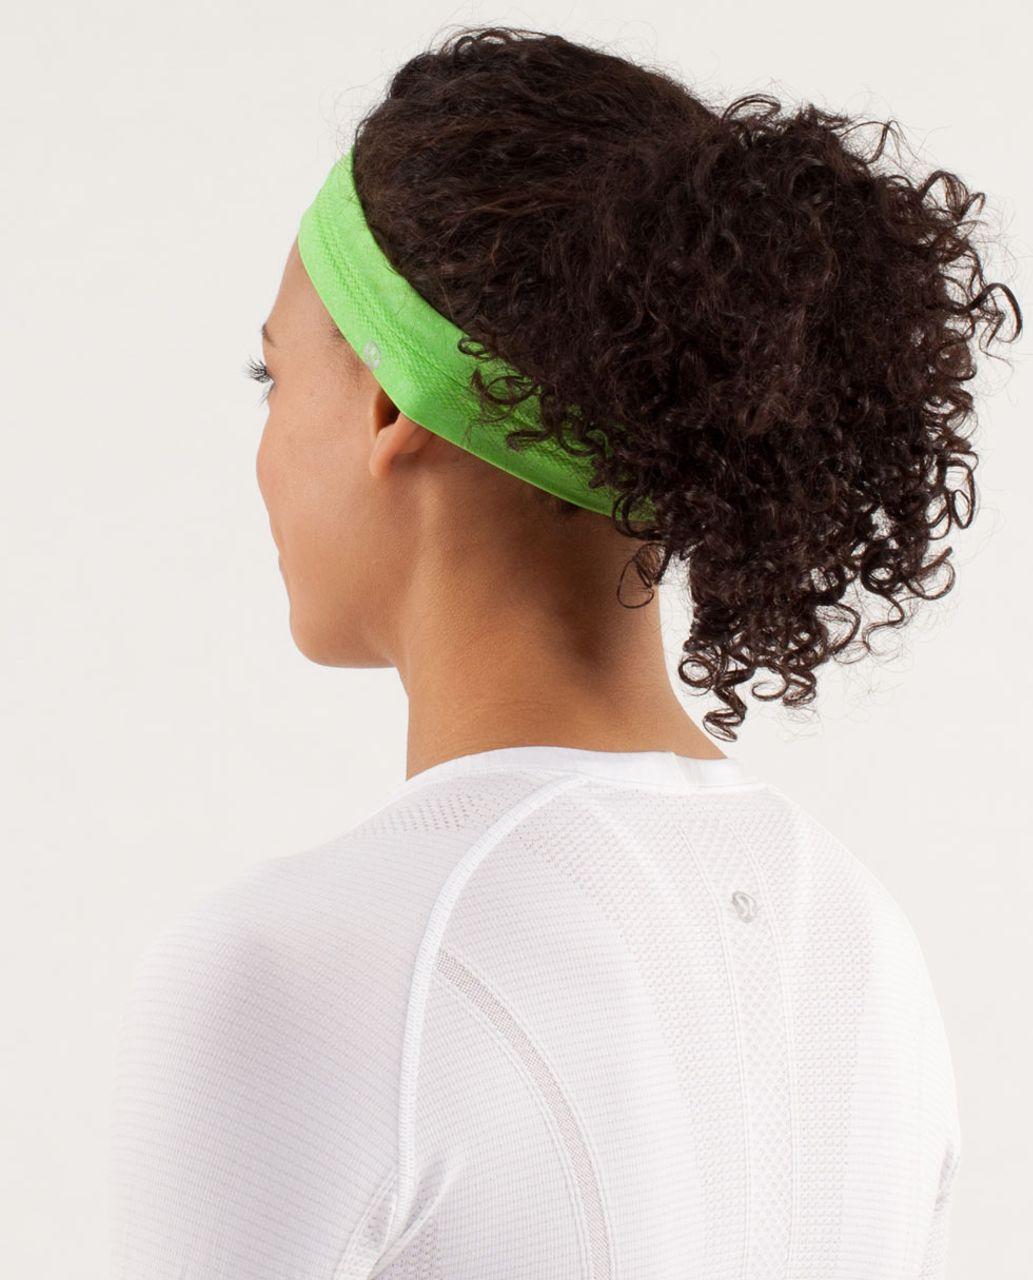 Lululemon Swiftly Headband - Frond